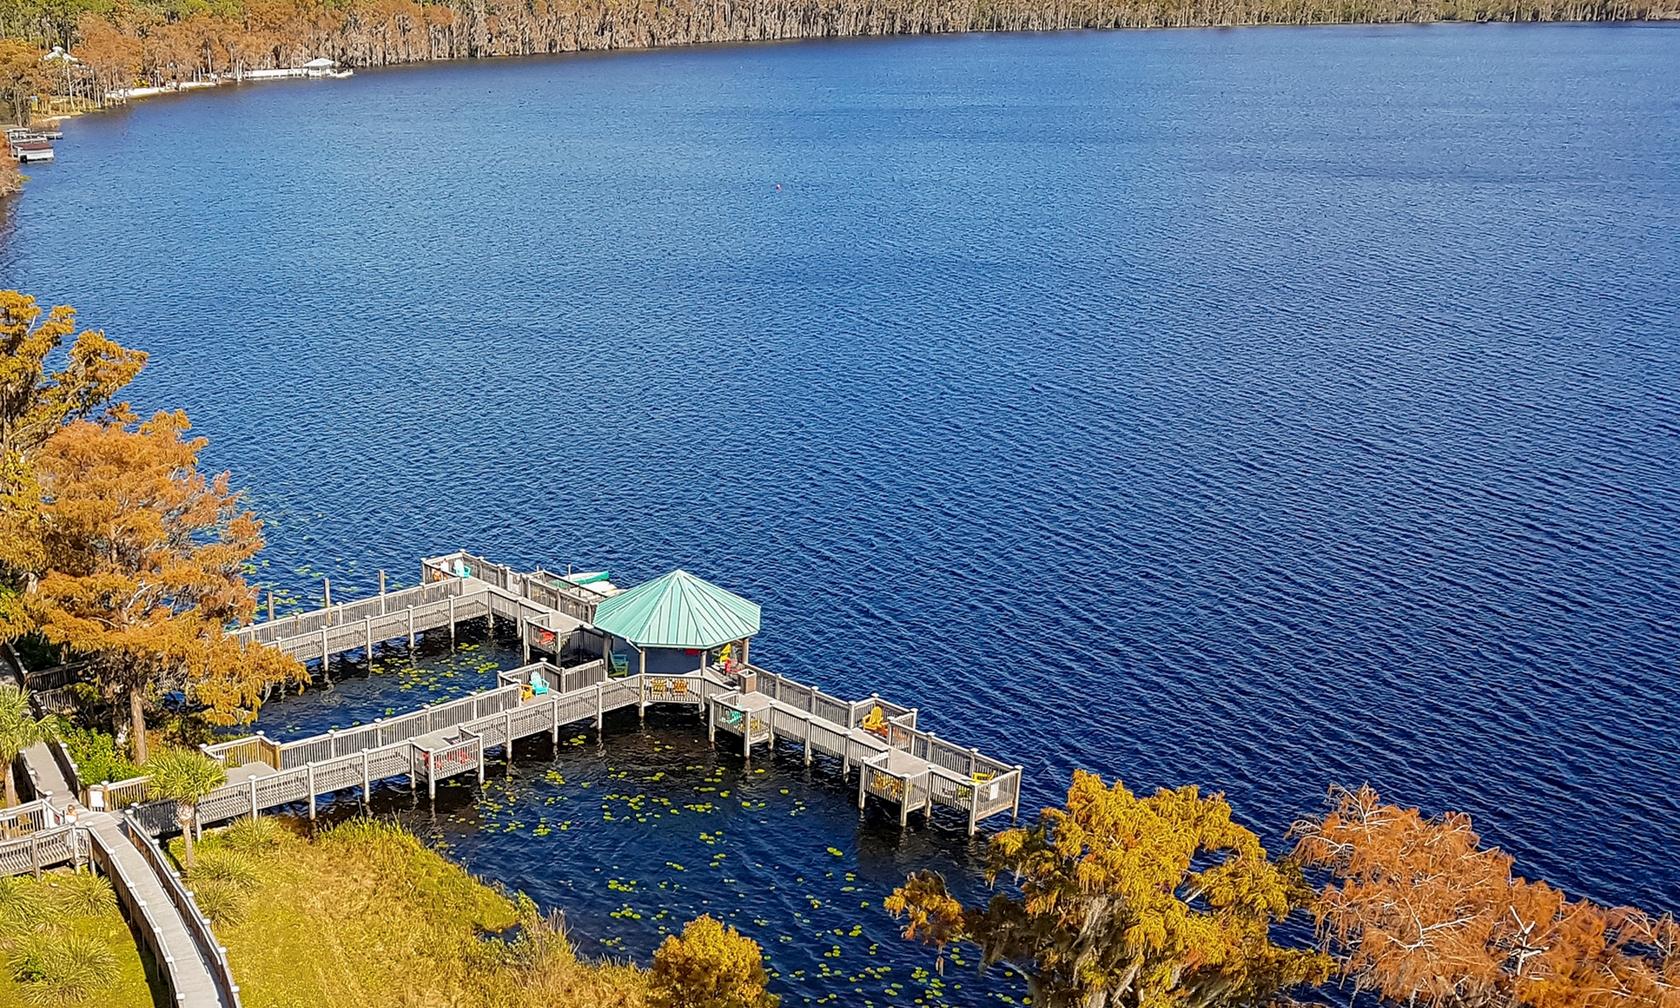 House and condo vacation rentals in Bay Lake